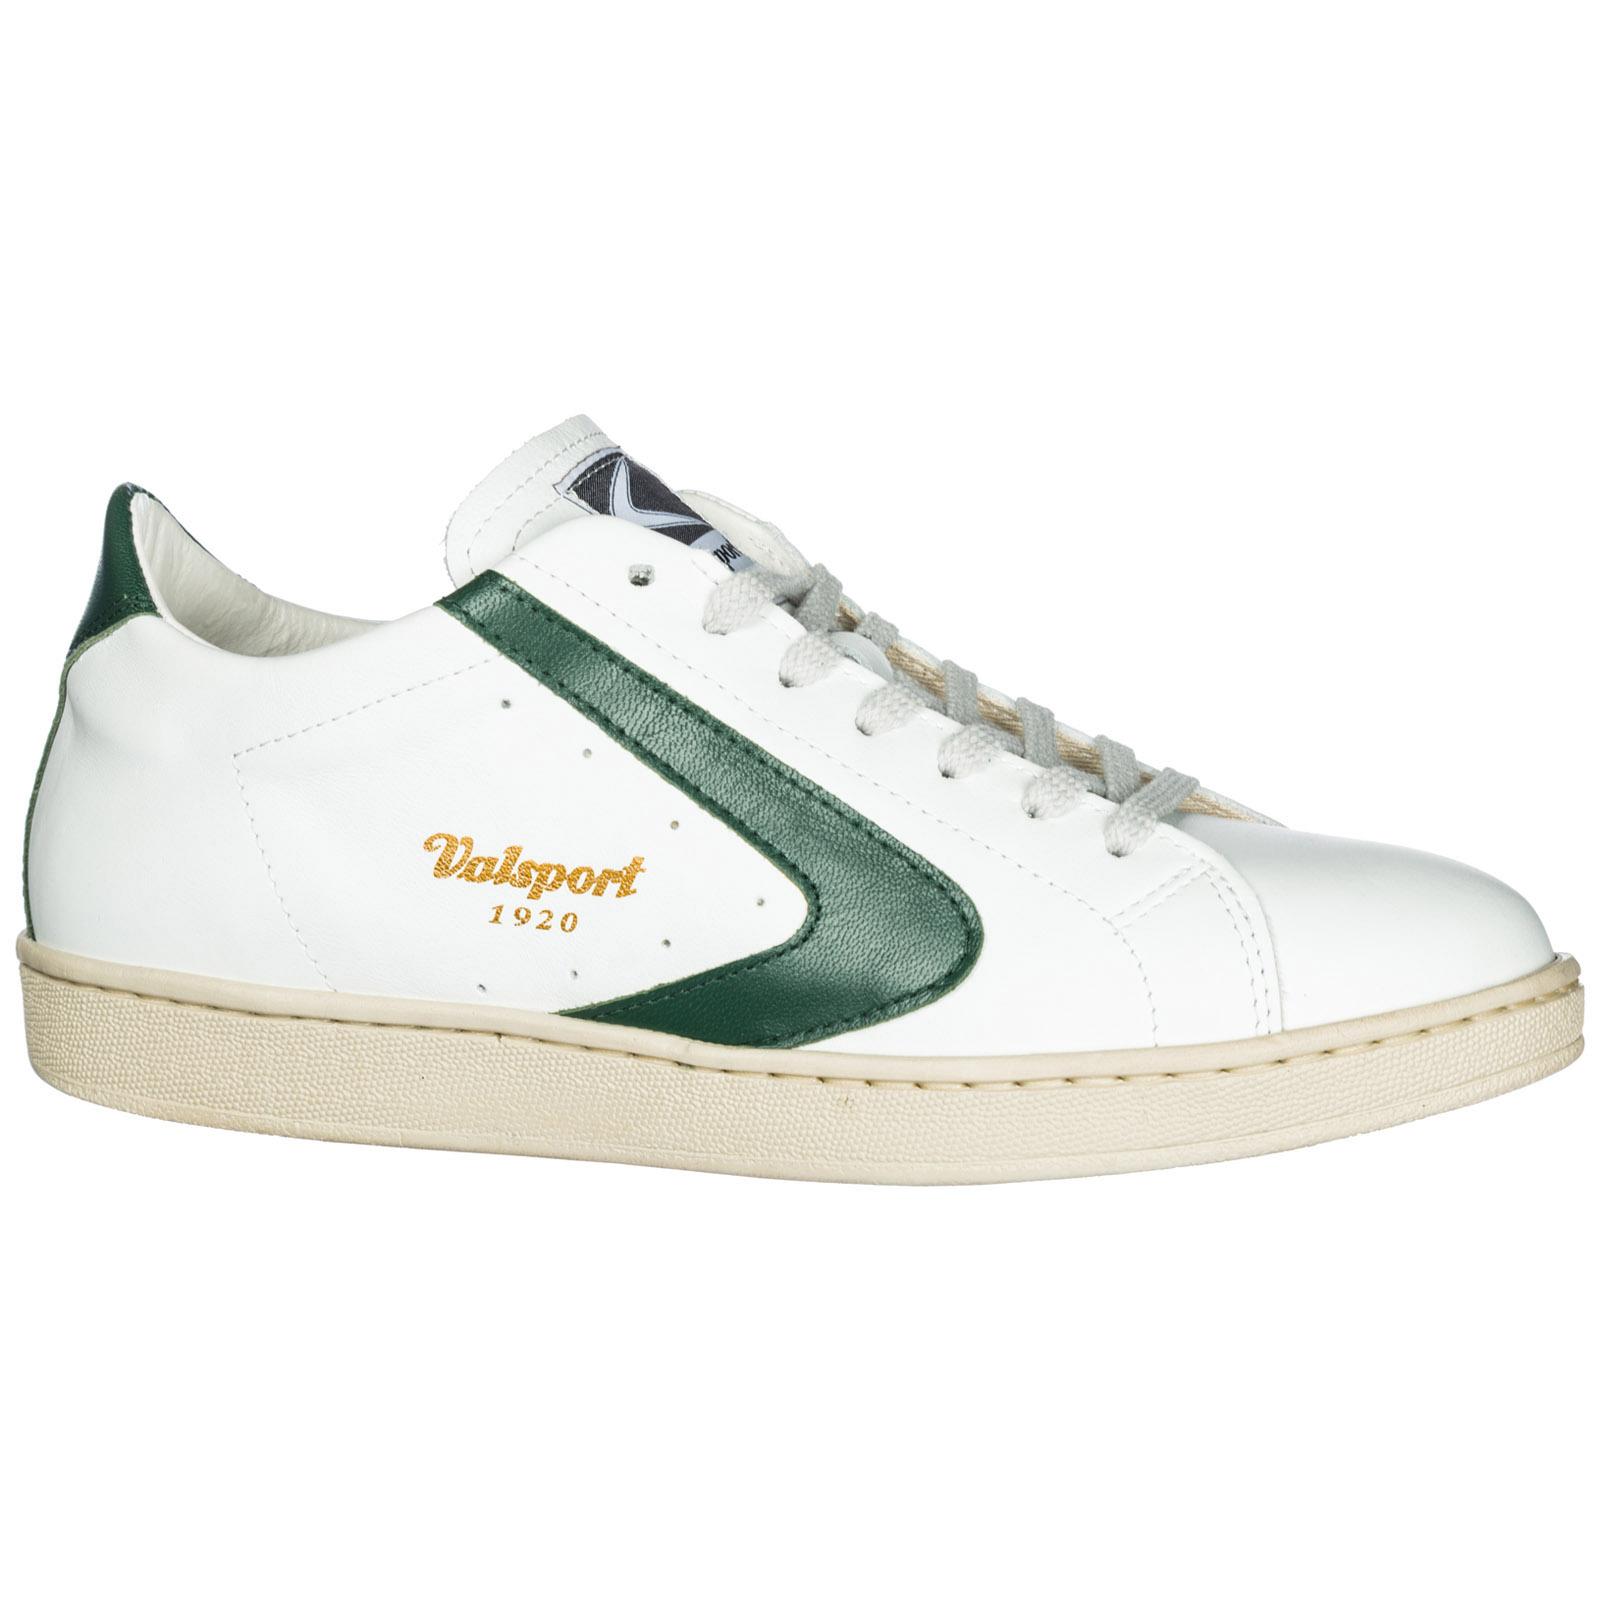 Evergreen Tourbevergreen Sneakers Bianco Valsport 1920 Tournament D9WHEI2Y